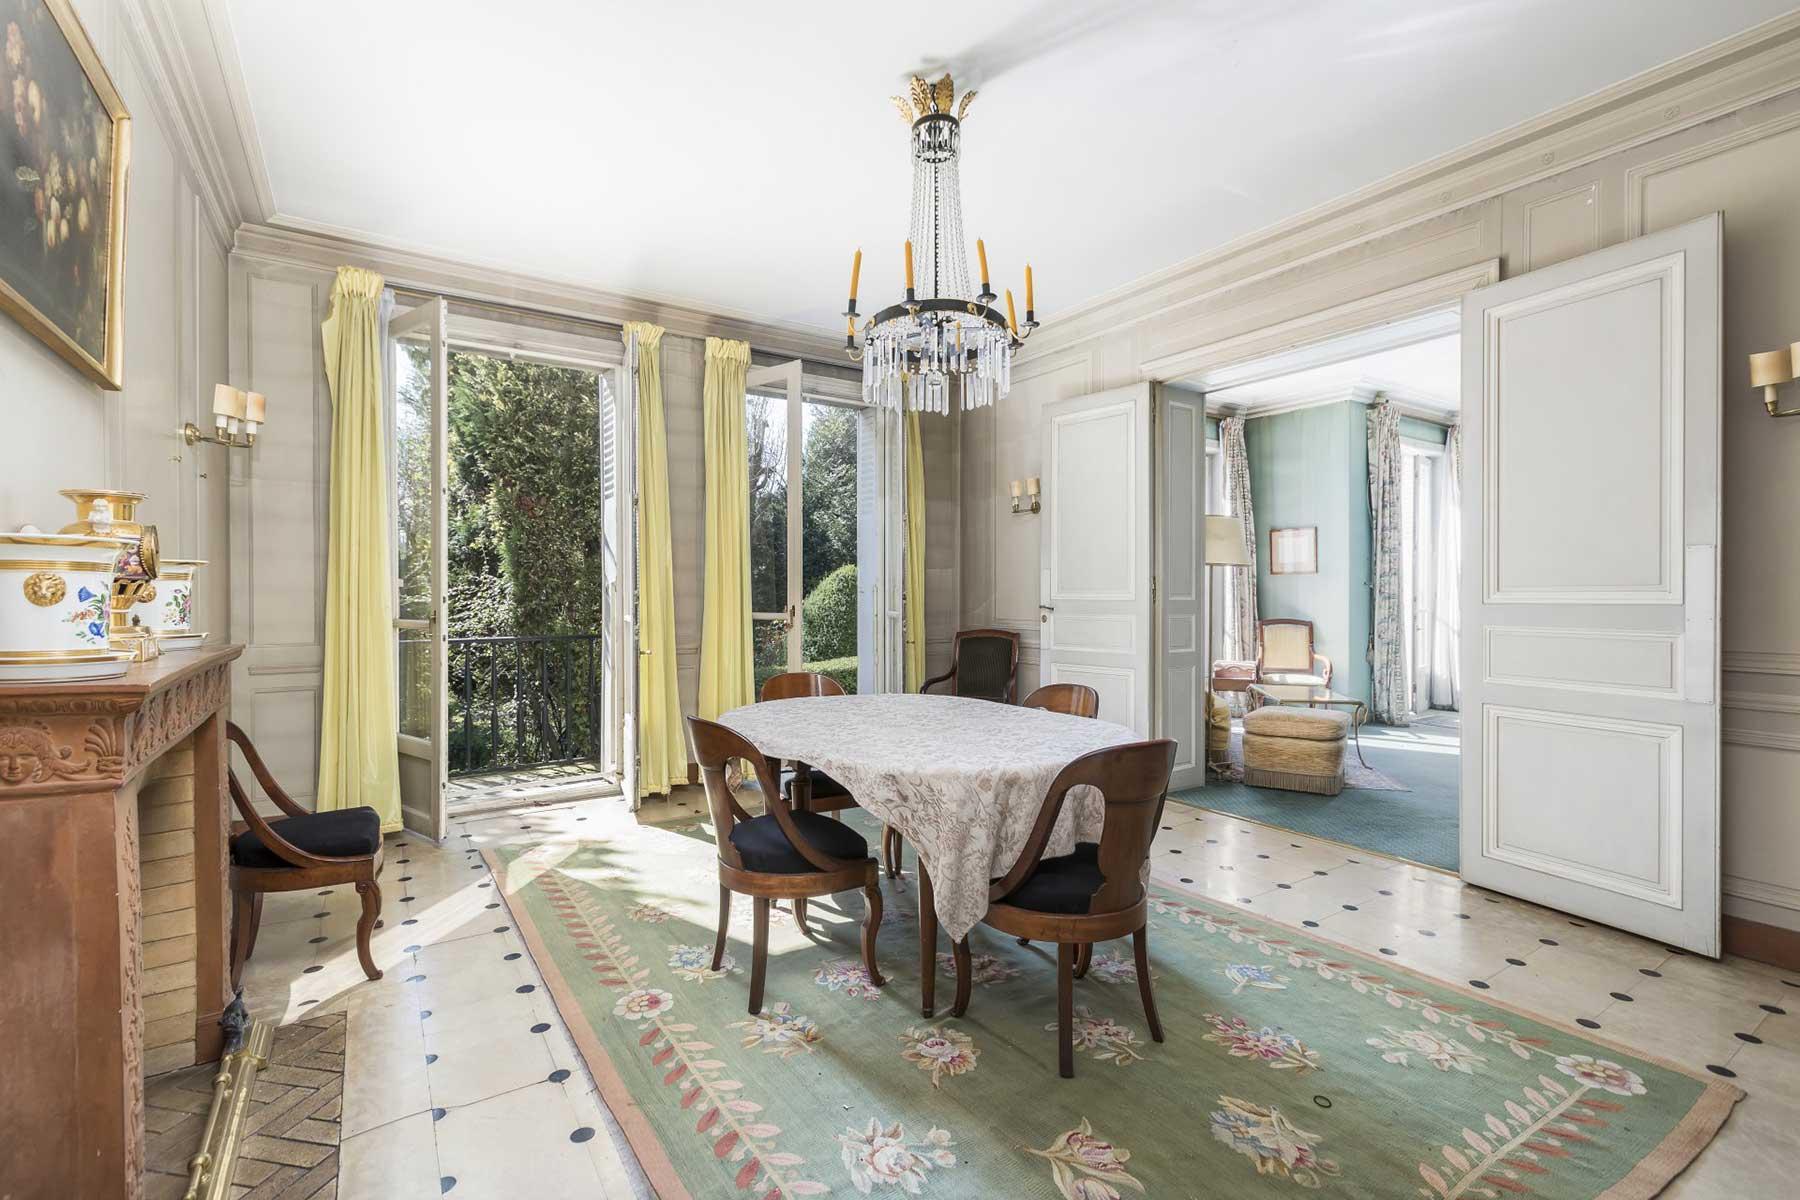 Saint-Maurice - Francia - Casa, 15 cuartos, 7 habitaciones - Slideshow Picture 4